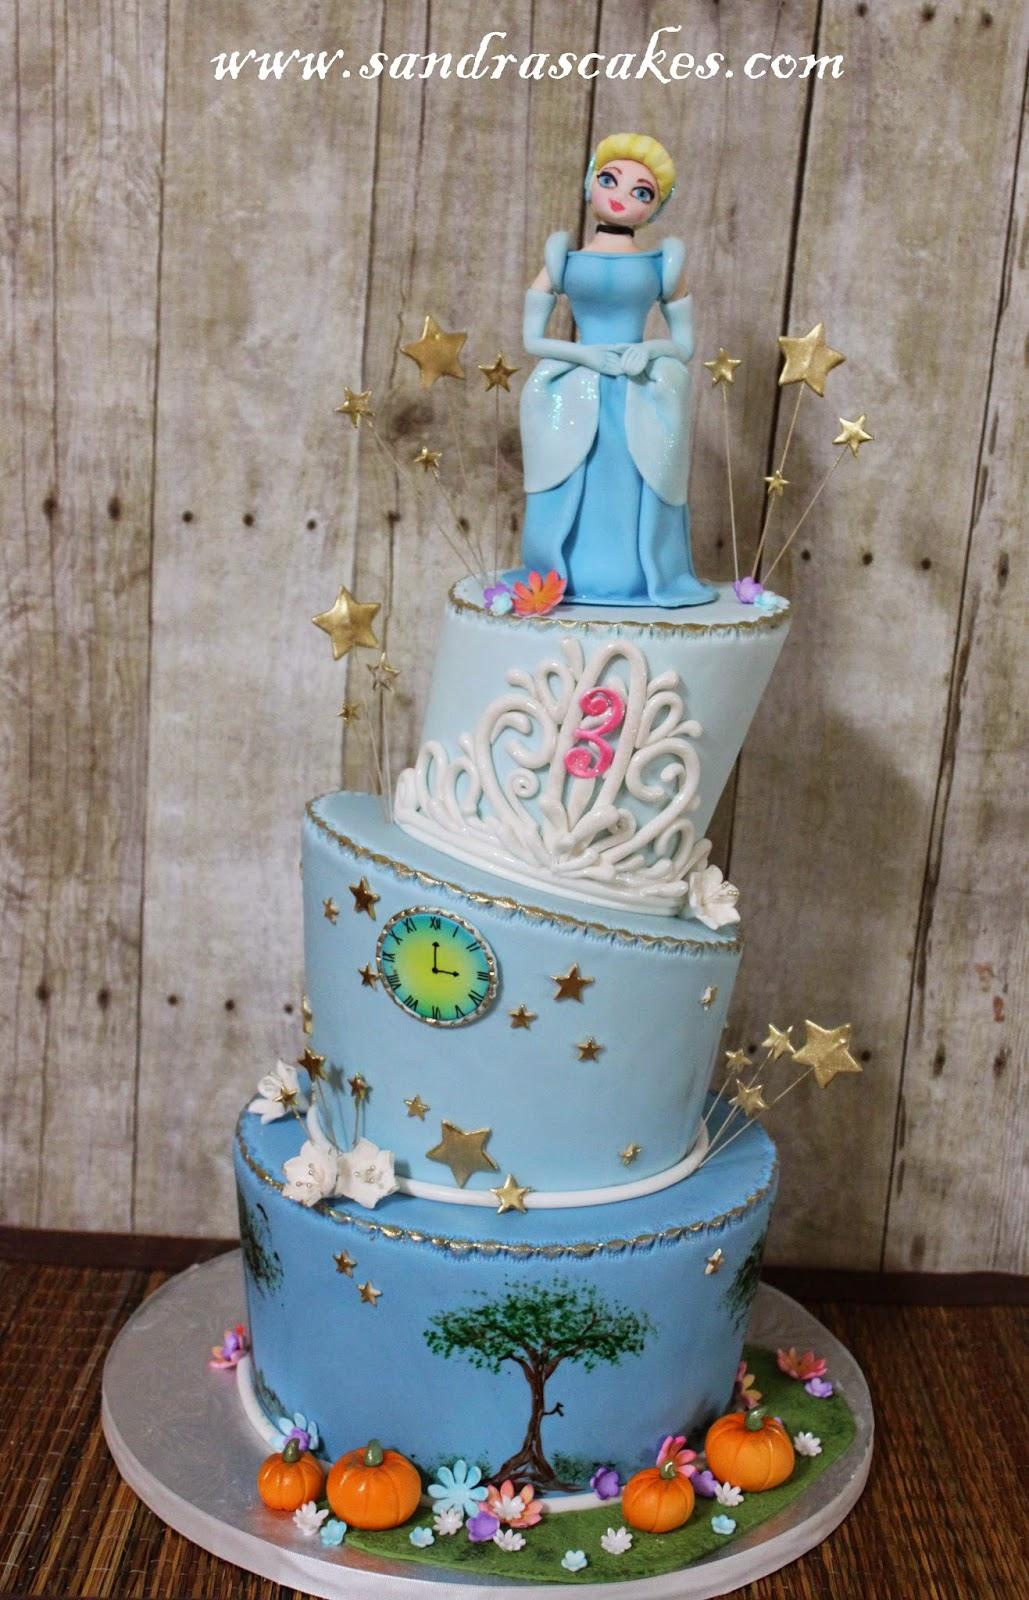 Cinderella Themed Birthday Cake